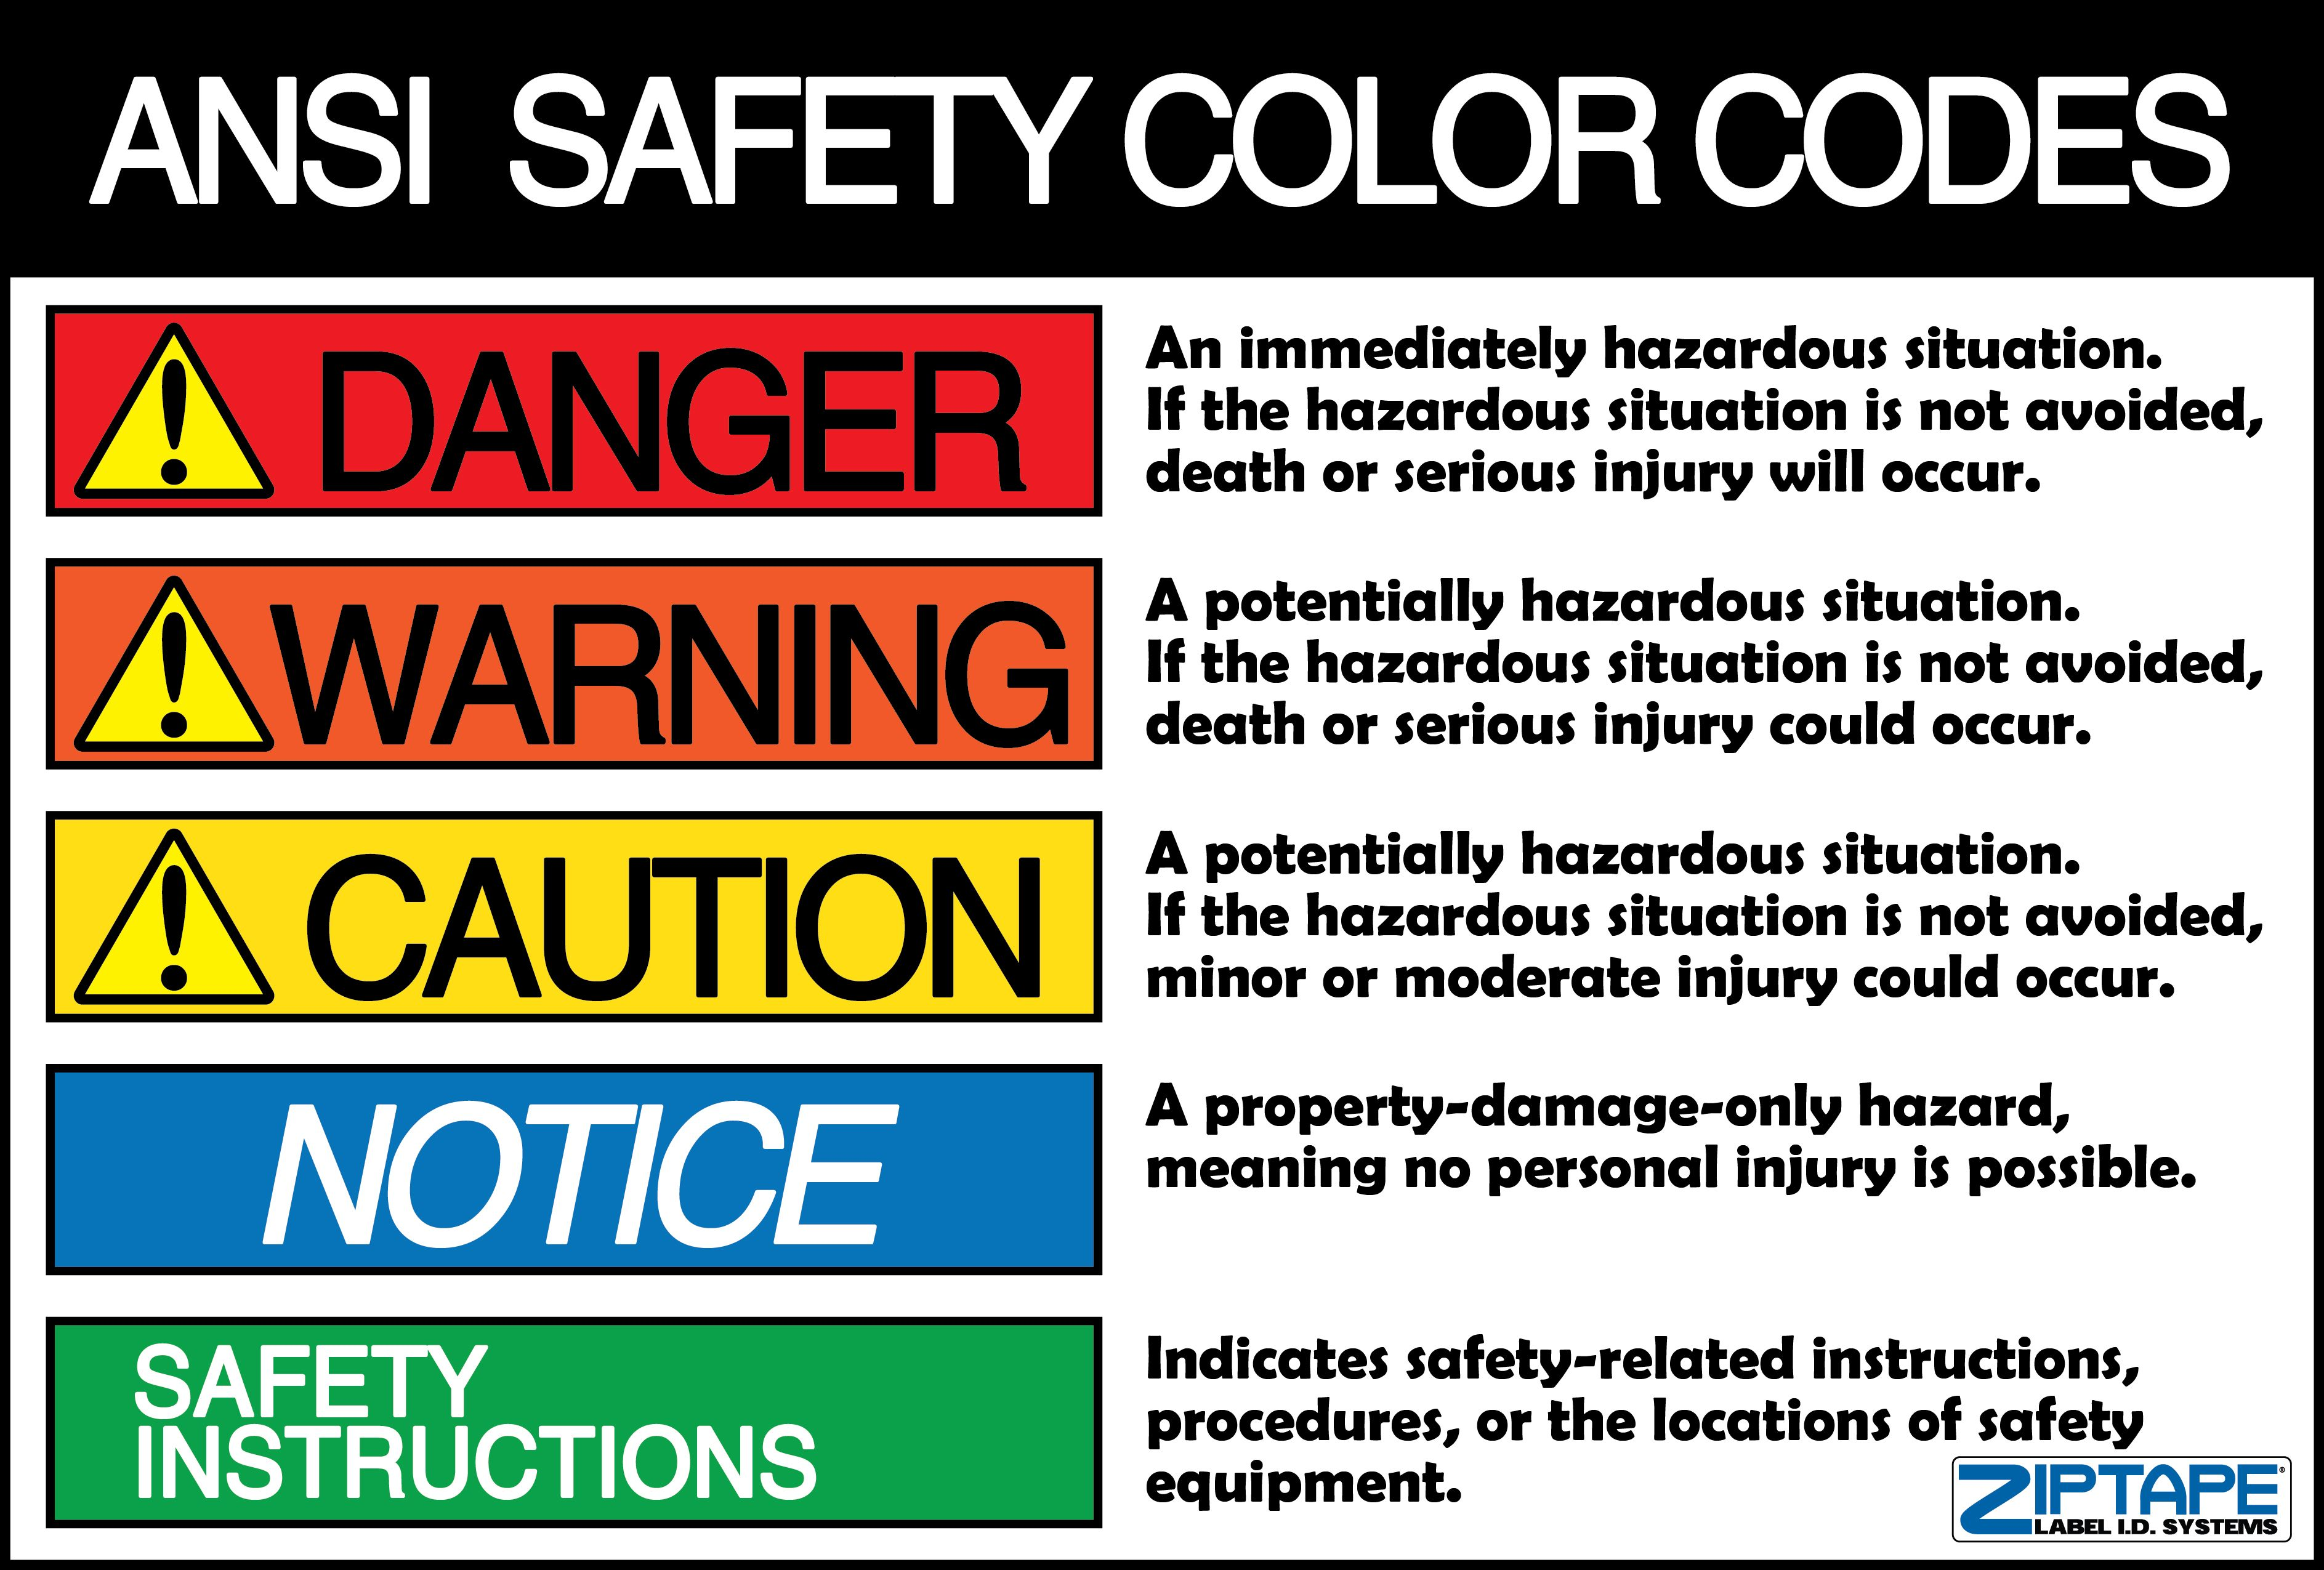 Ansi Z535 1 Safety Color Codes